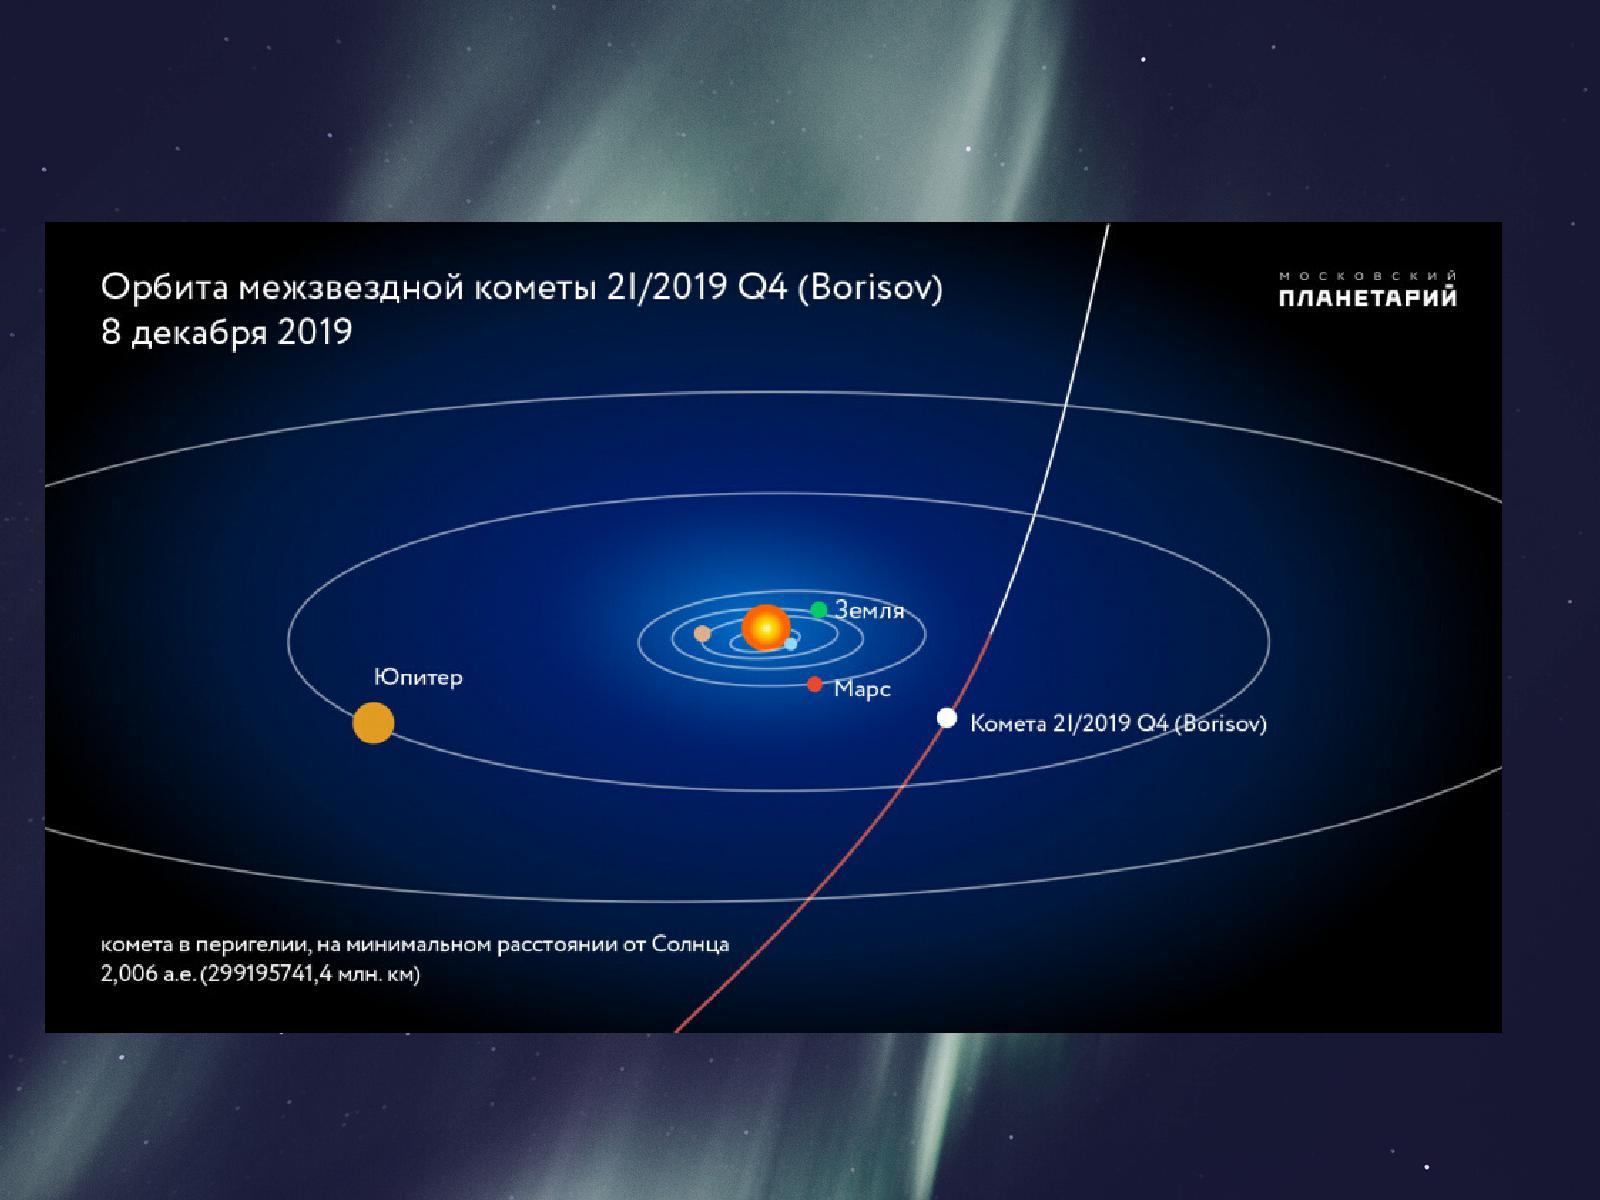 Орбита межзвёздной кометы 21/2019 Q4 (Borisov) 8 декабря 2019